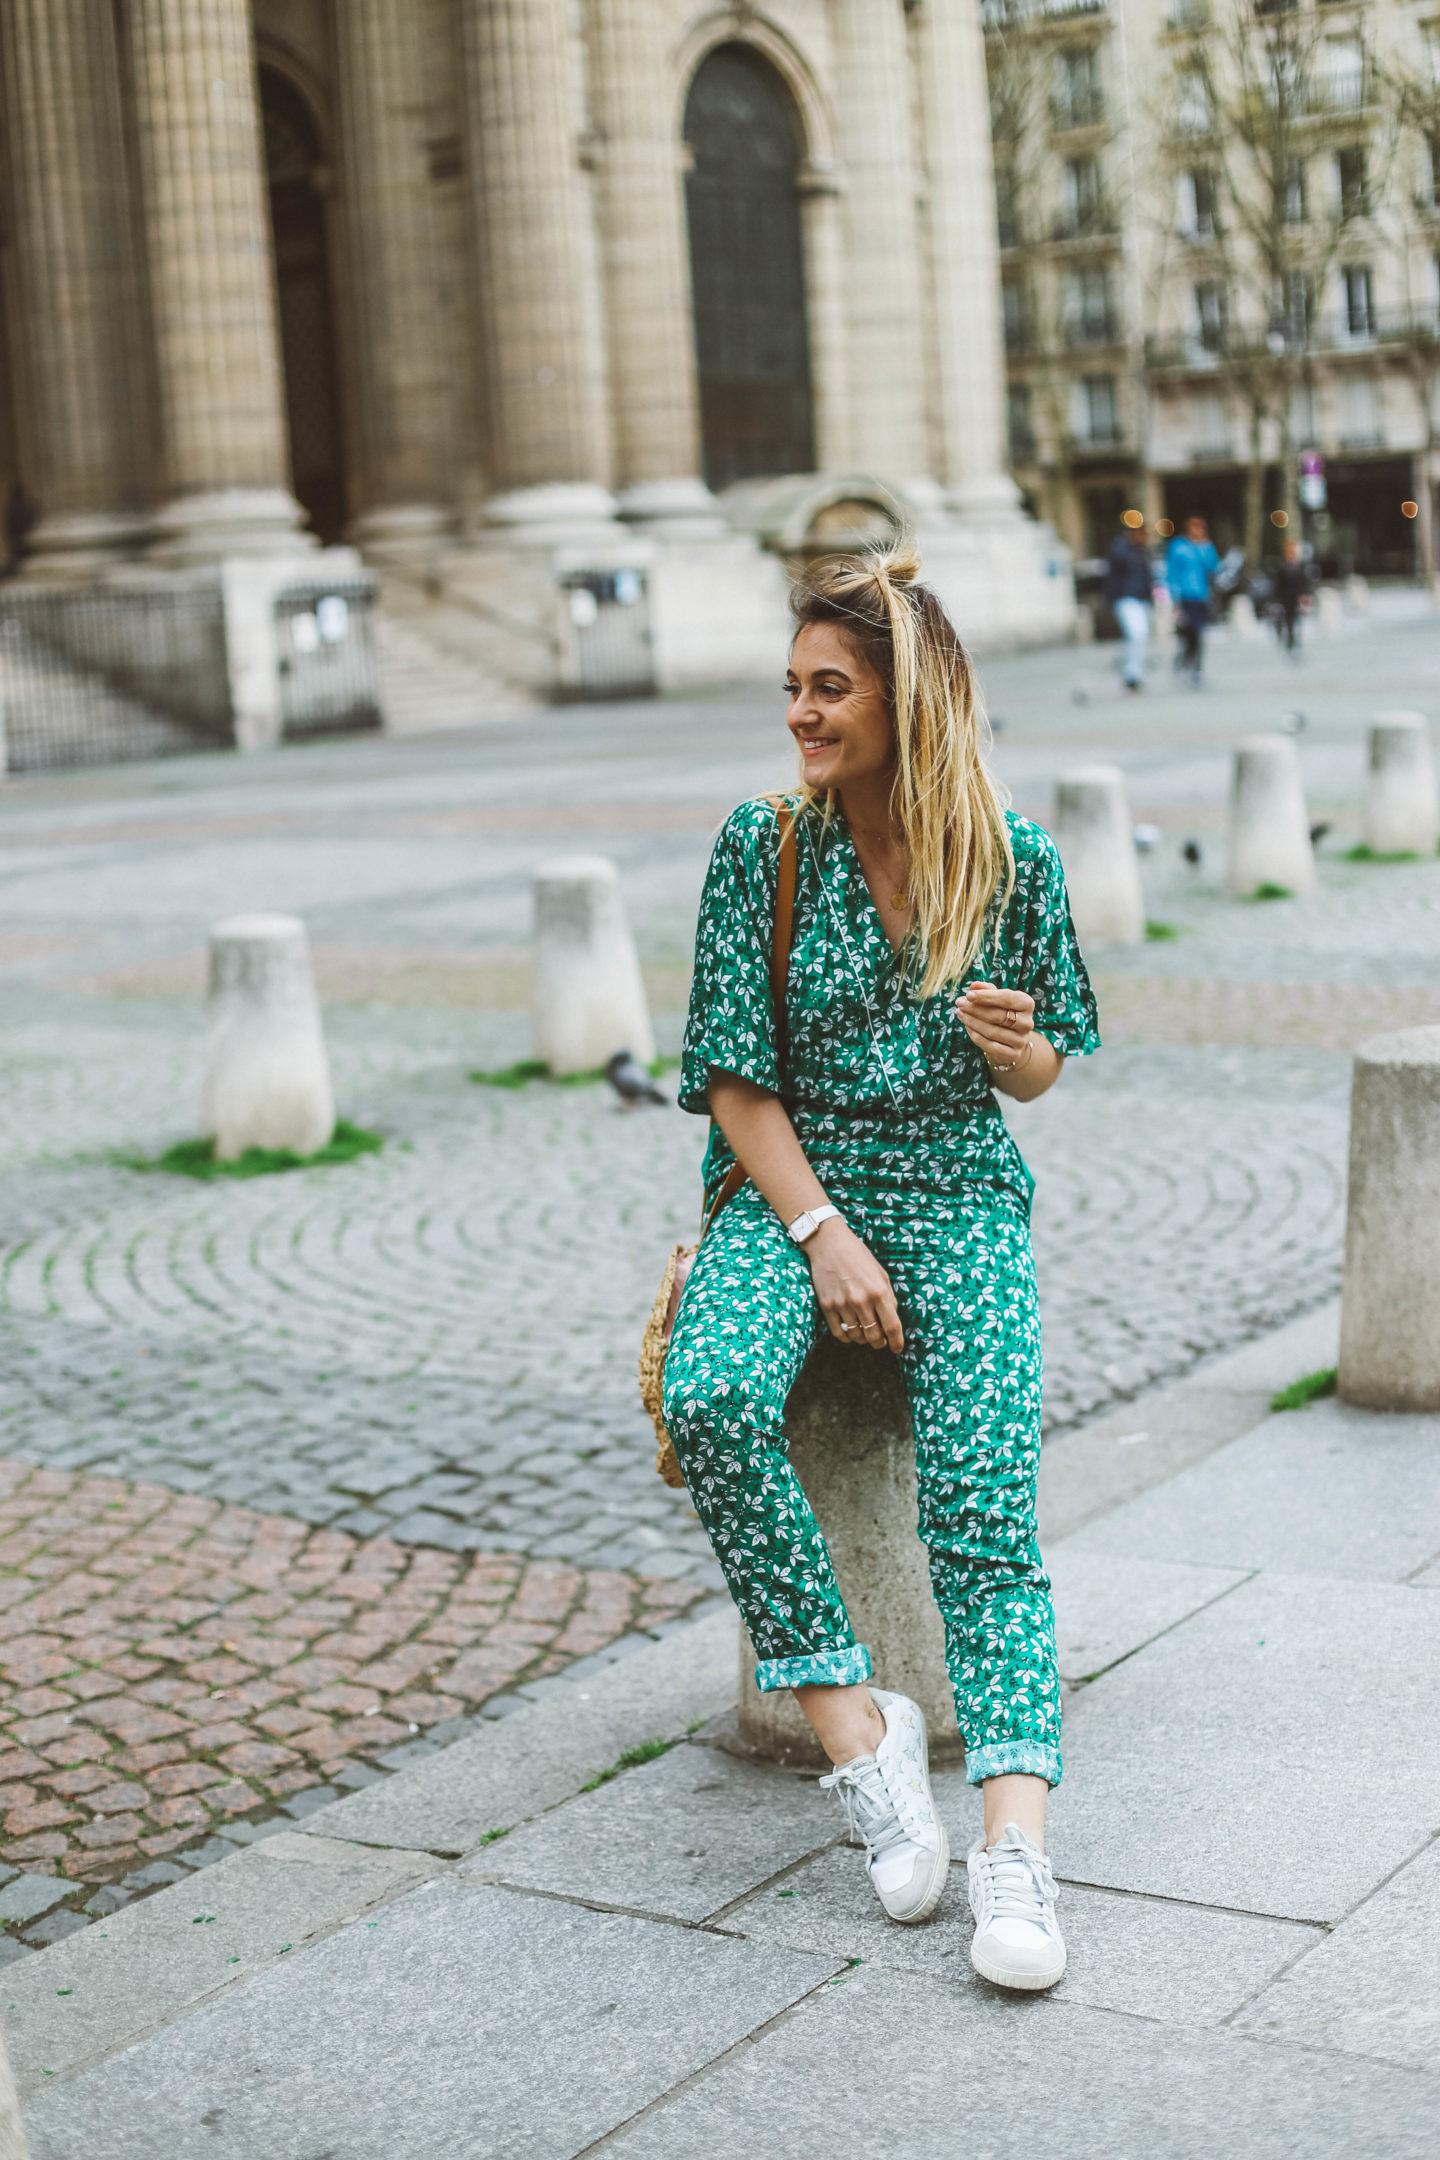 Sneakers Ash - Blondie Baby blog Paris mode et voyages